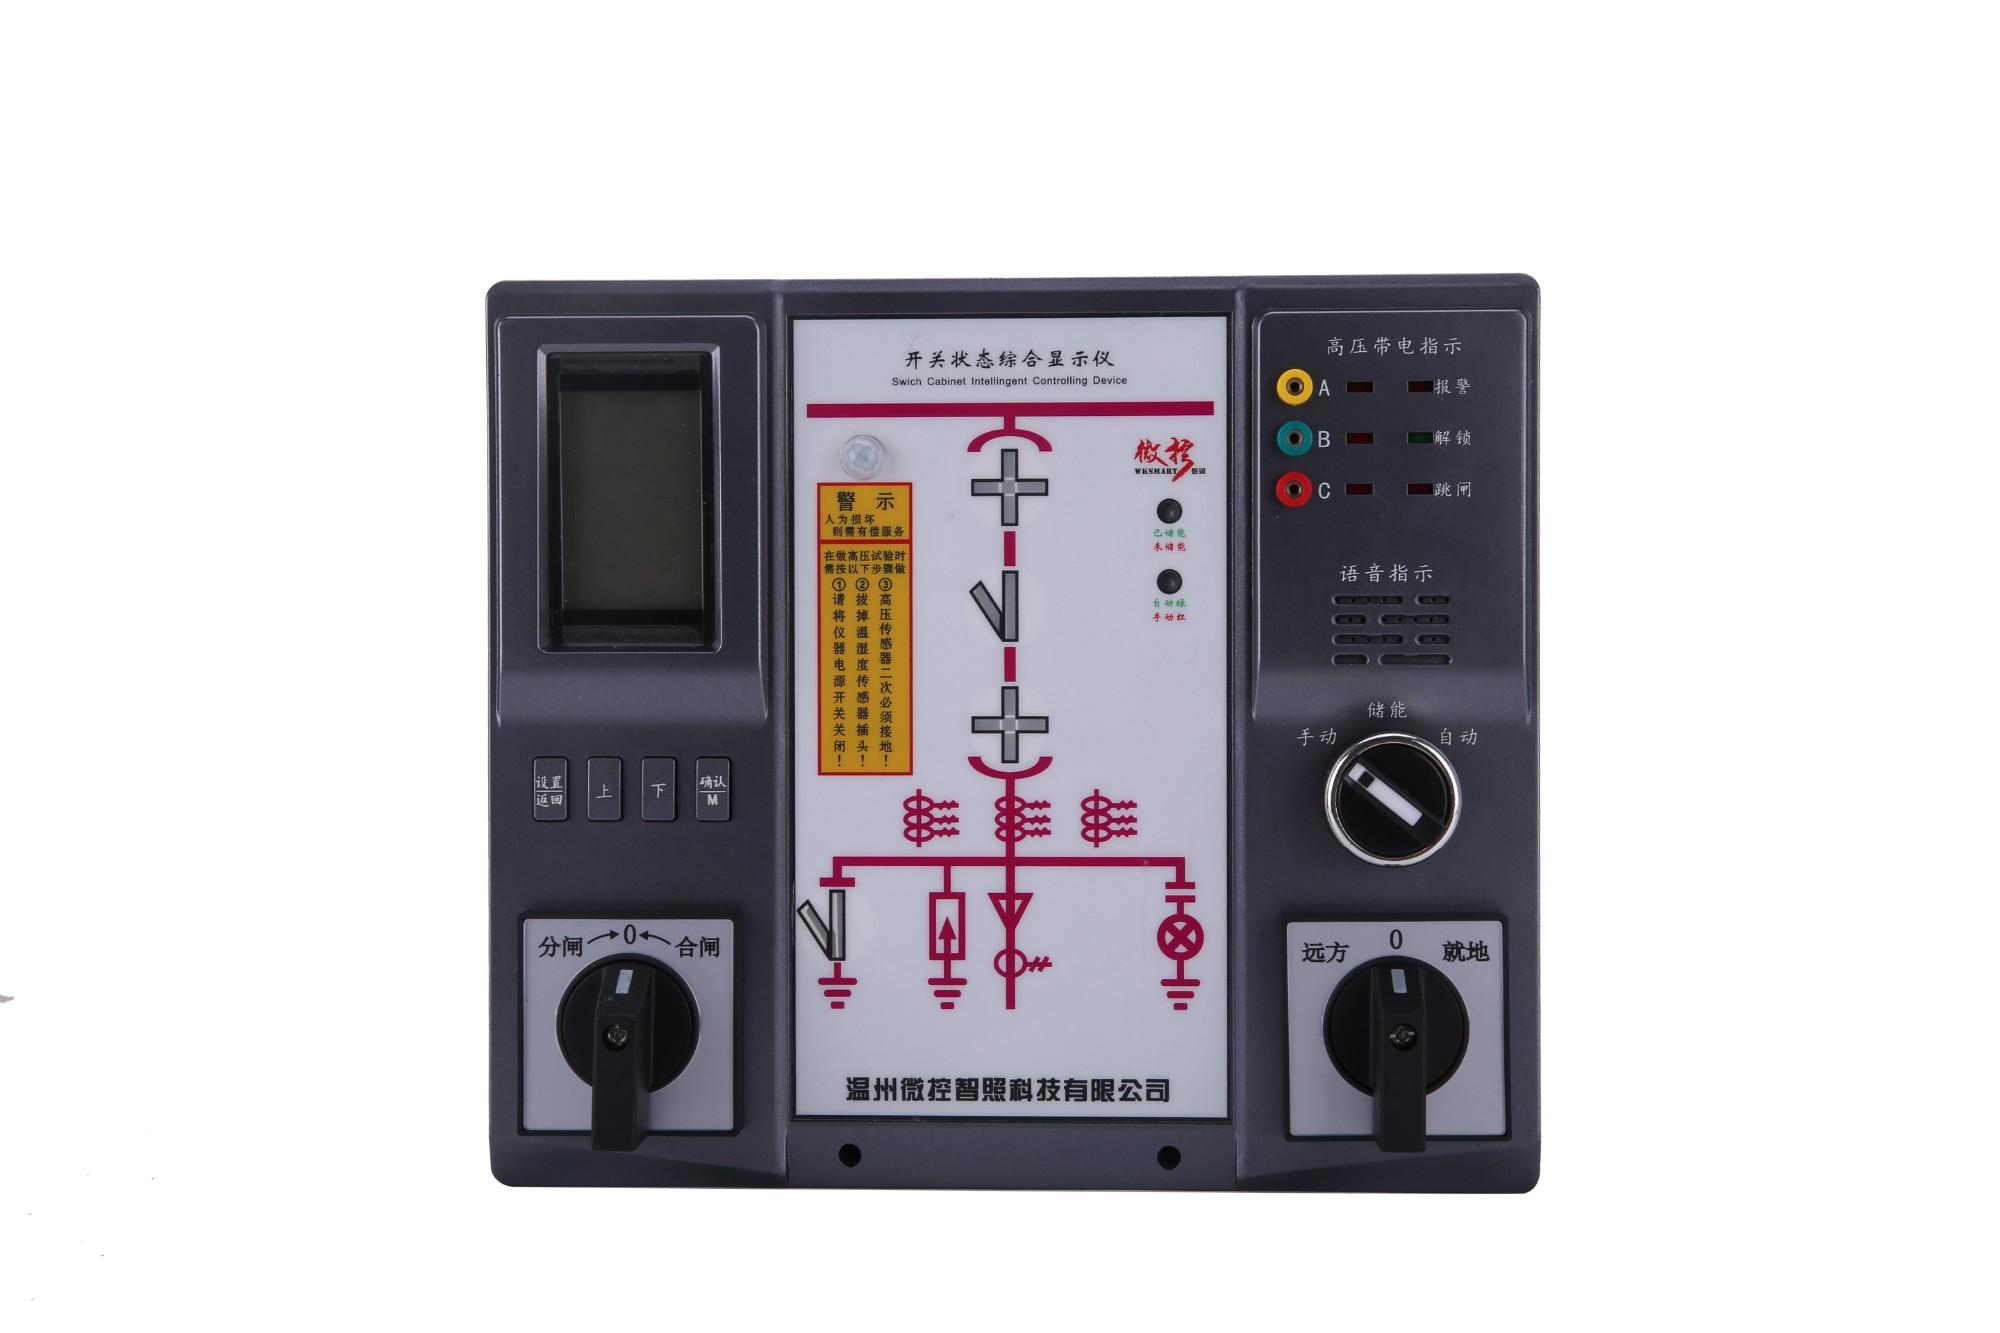 MS.CK-300系列LCD液晶型智能操控装置